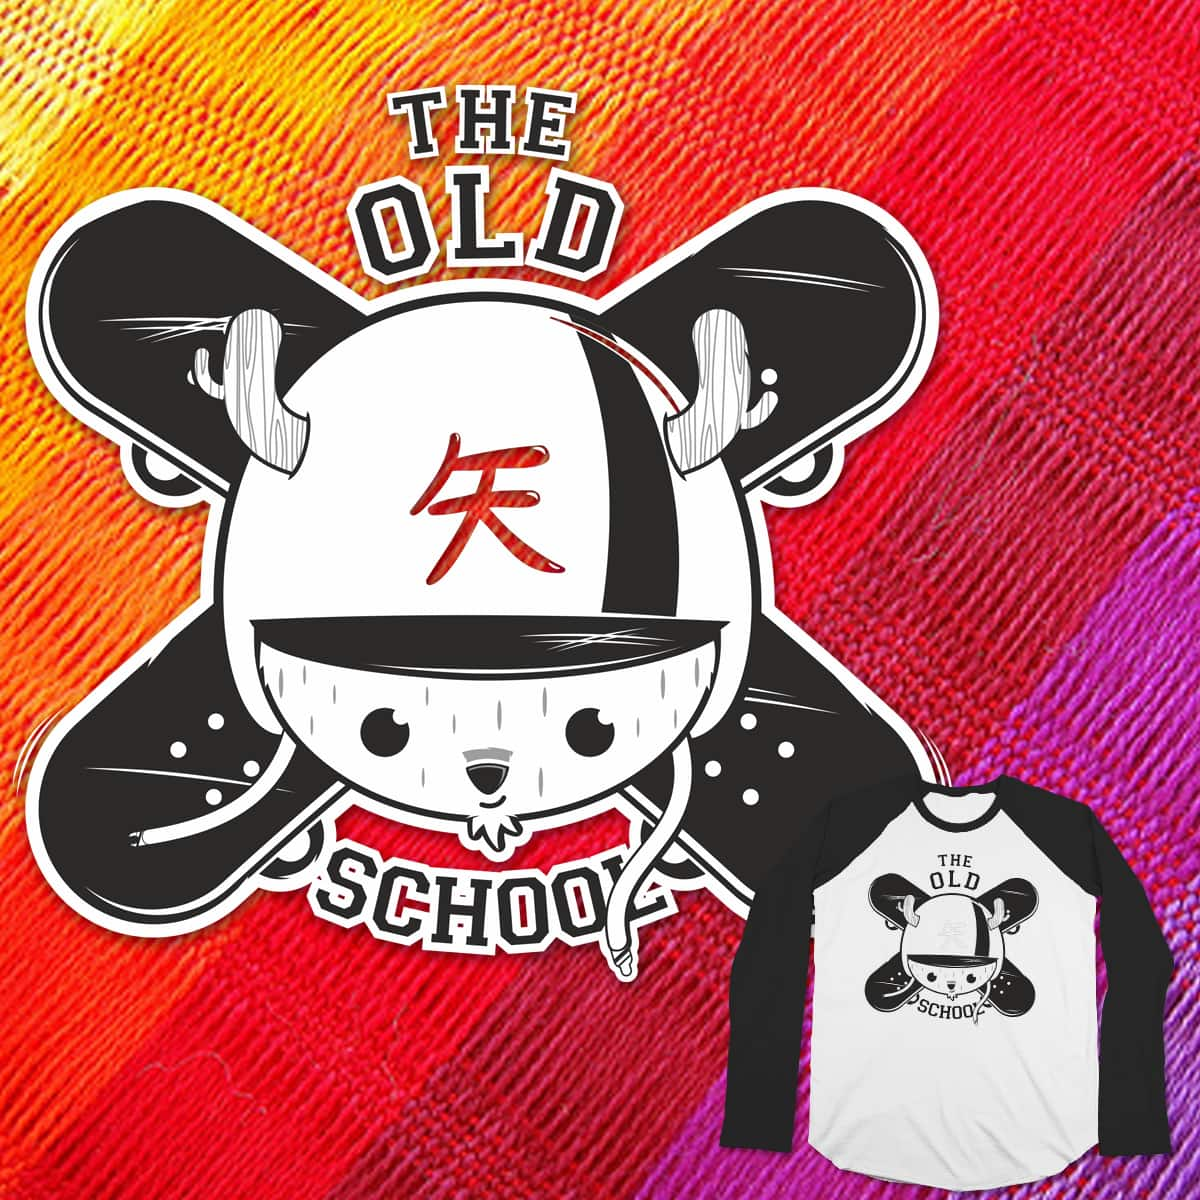 Old School by betoe on Threadless